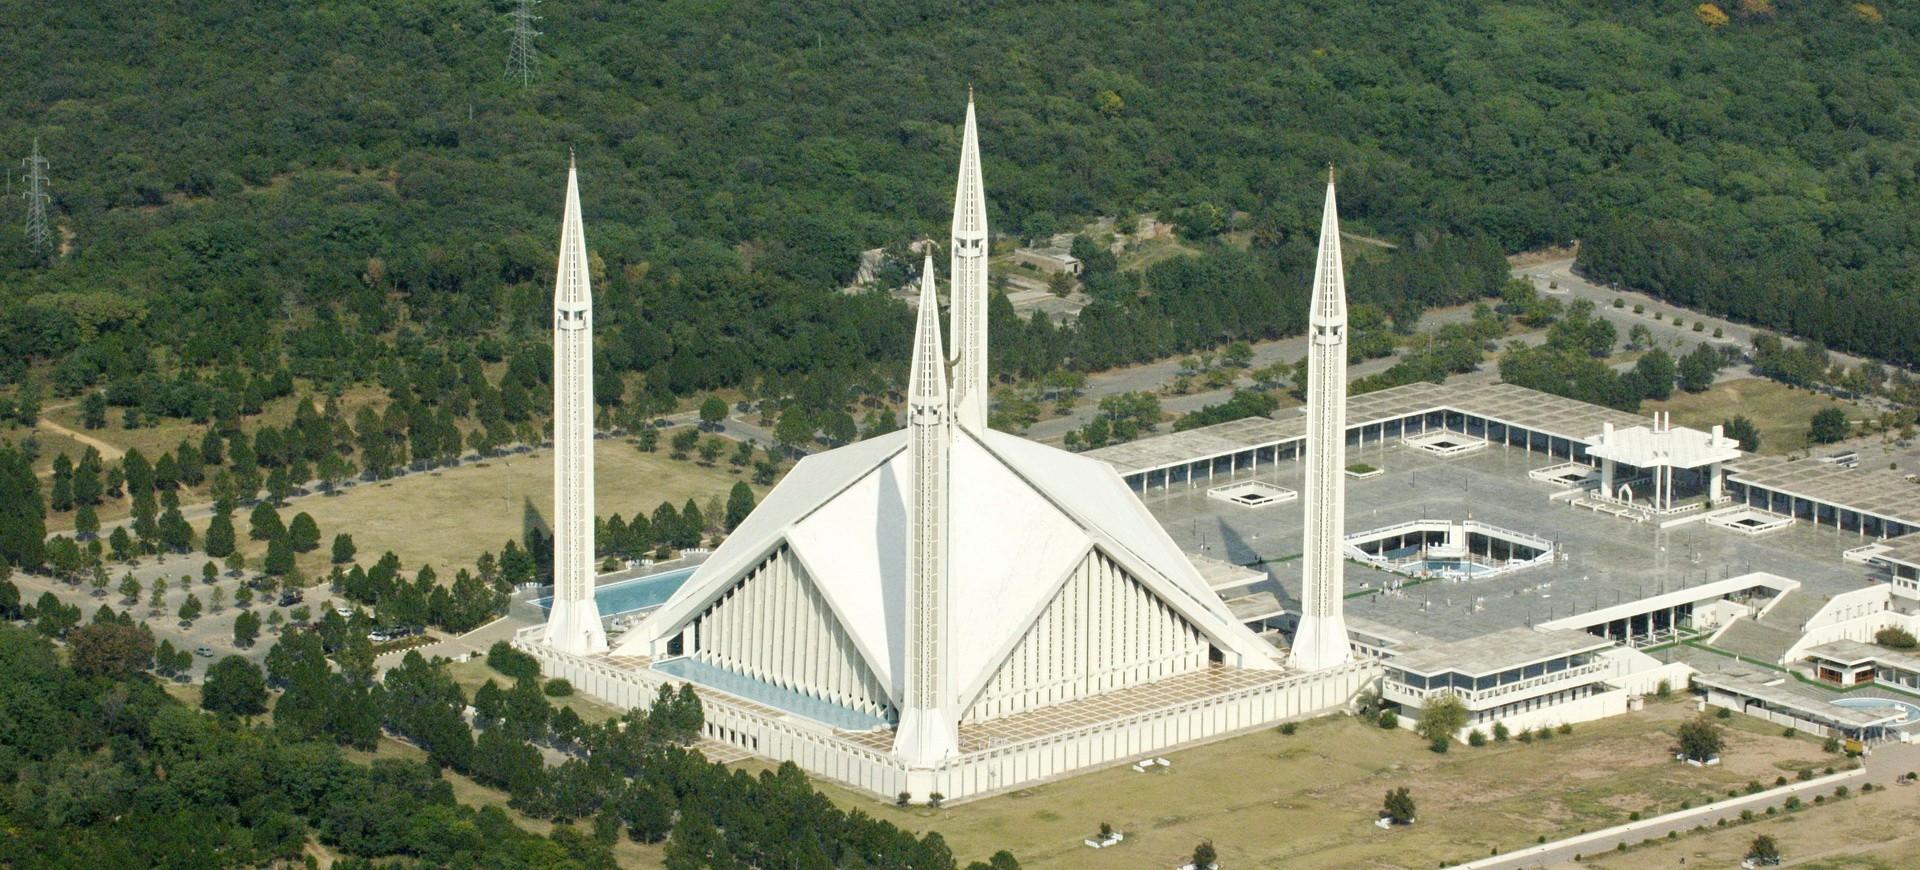 La Mosquée Faisal à Islamabad, la capitale